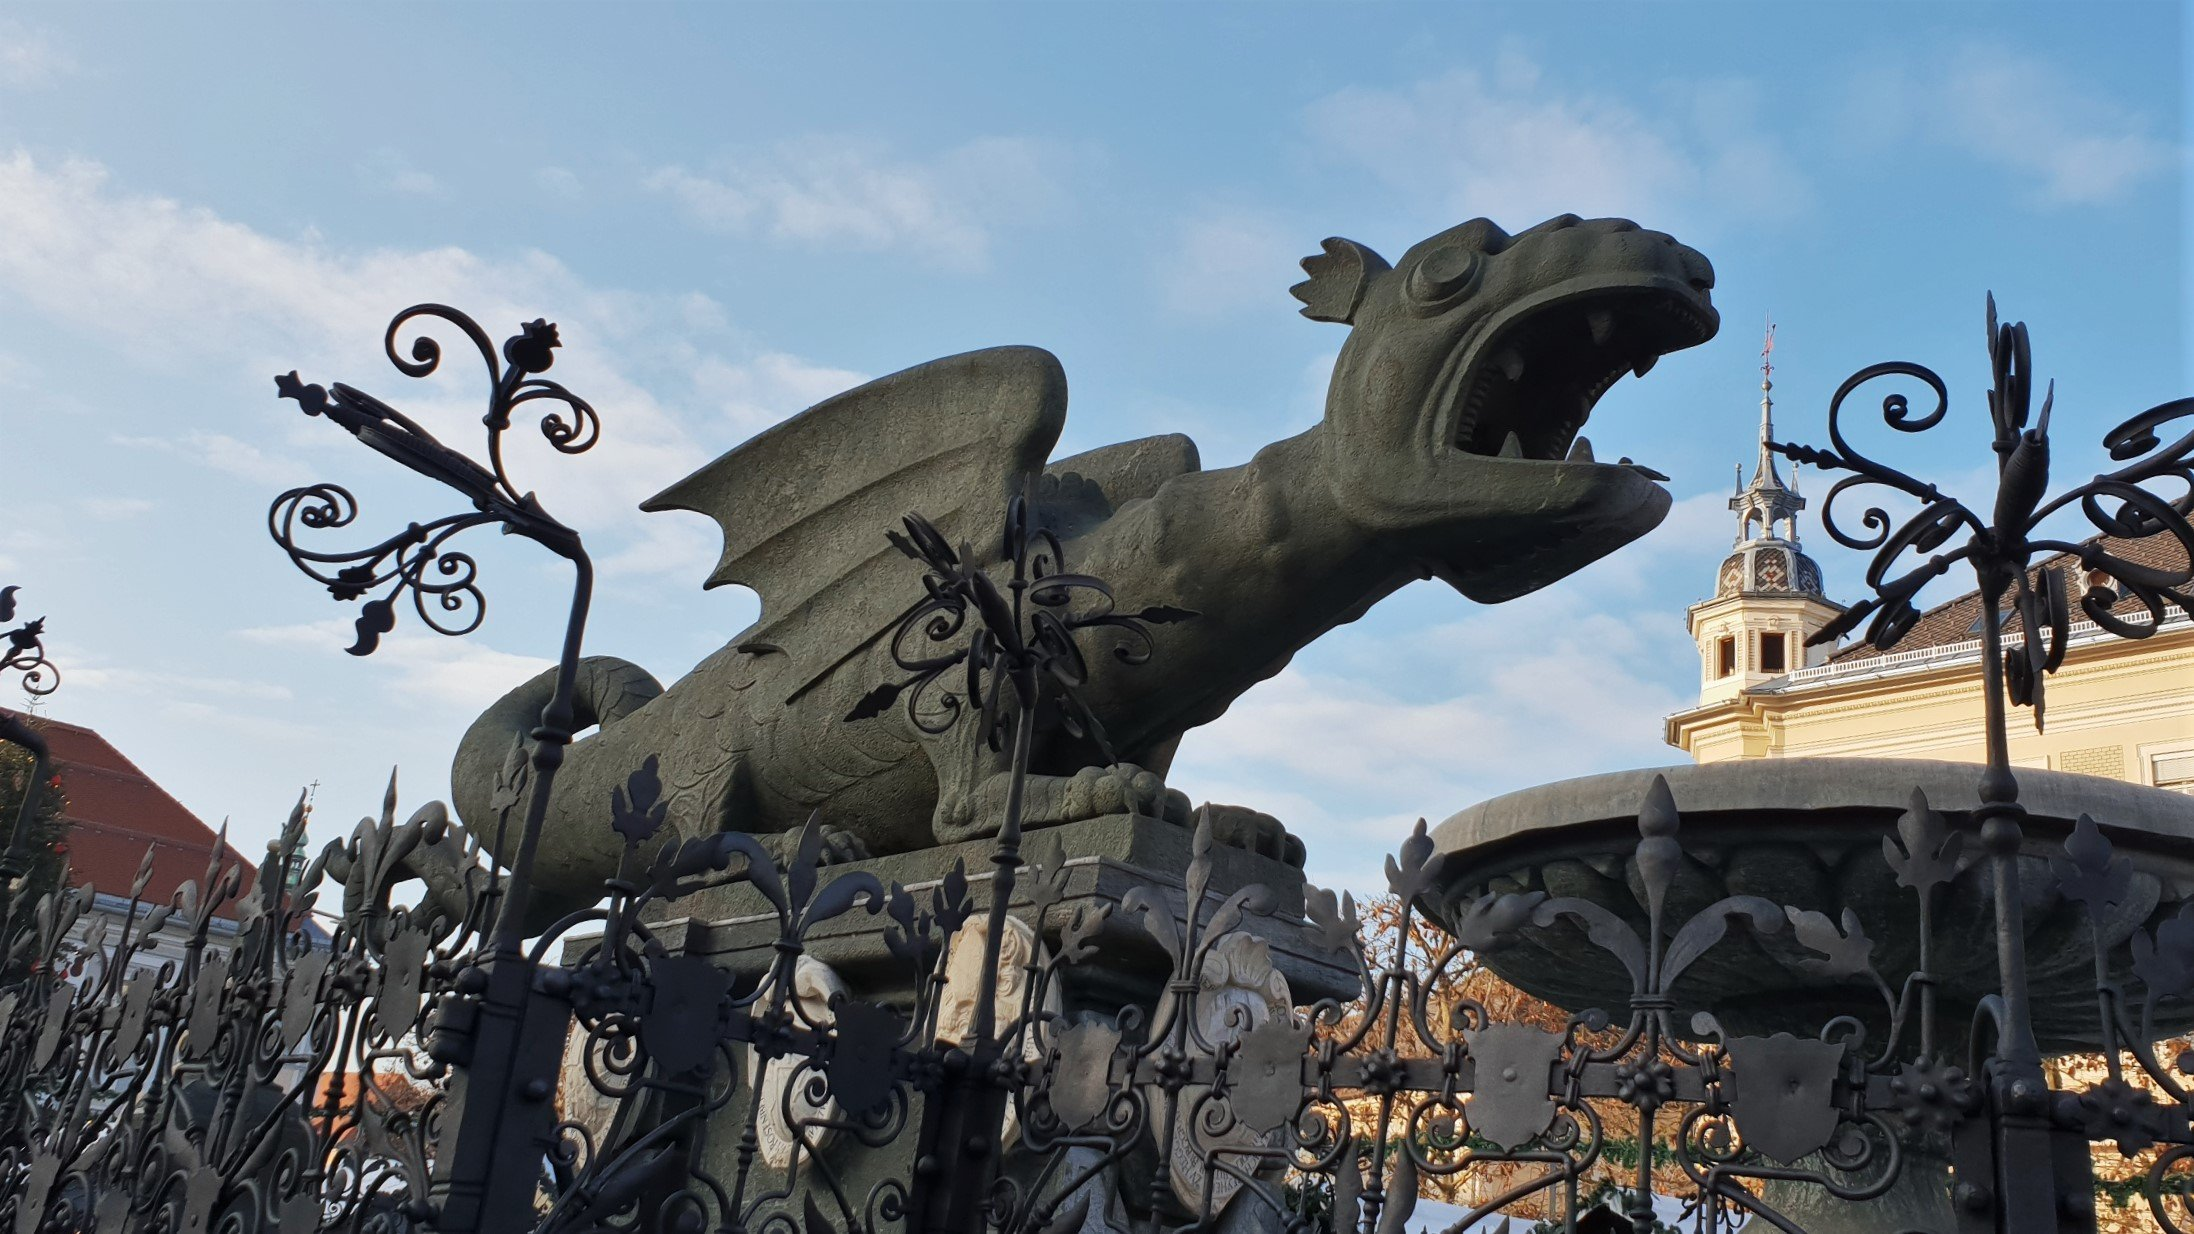 Dove si trova Klagenfurt